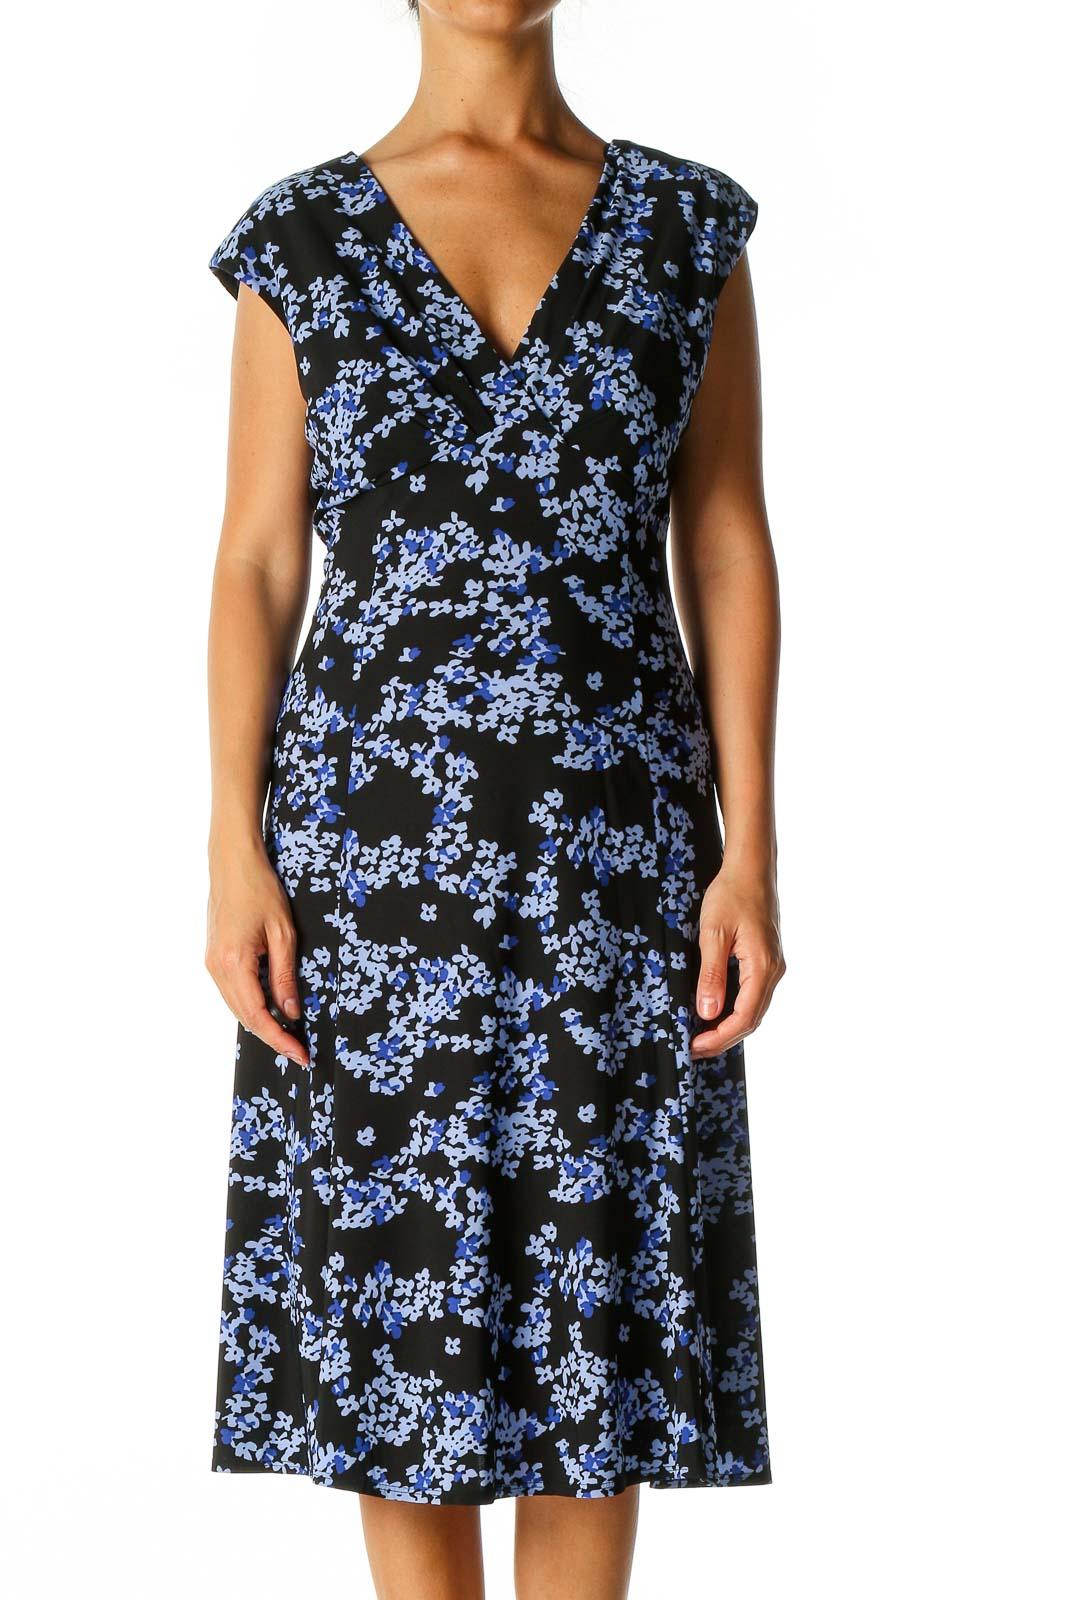 Black Floral Print Casual A-Line Dress Front